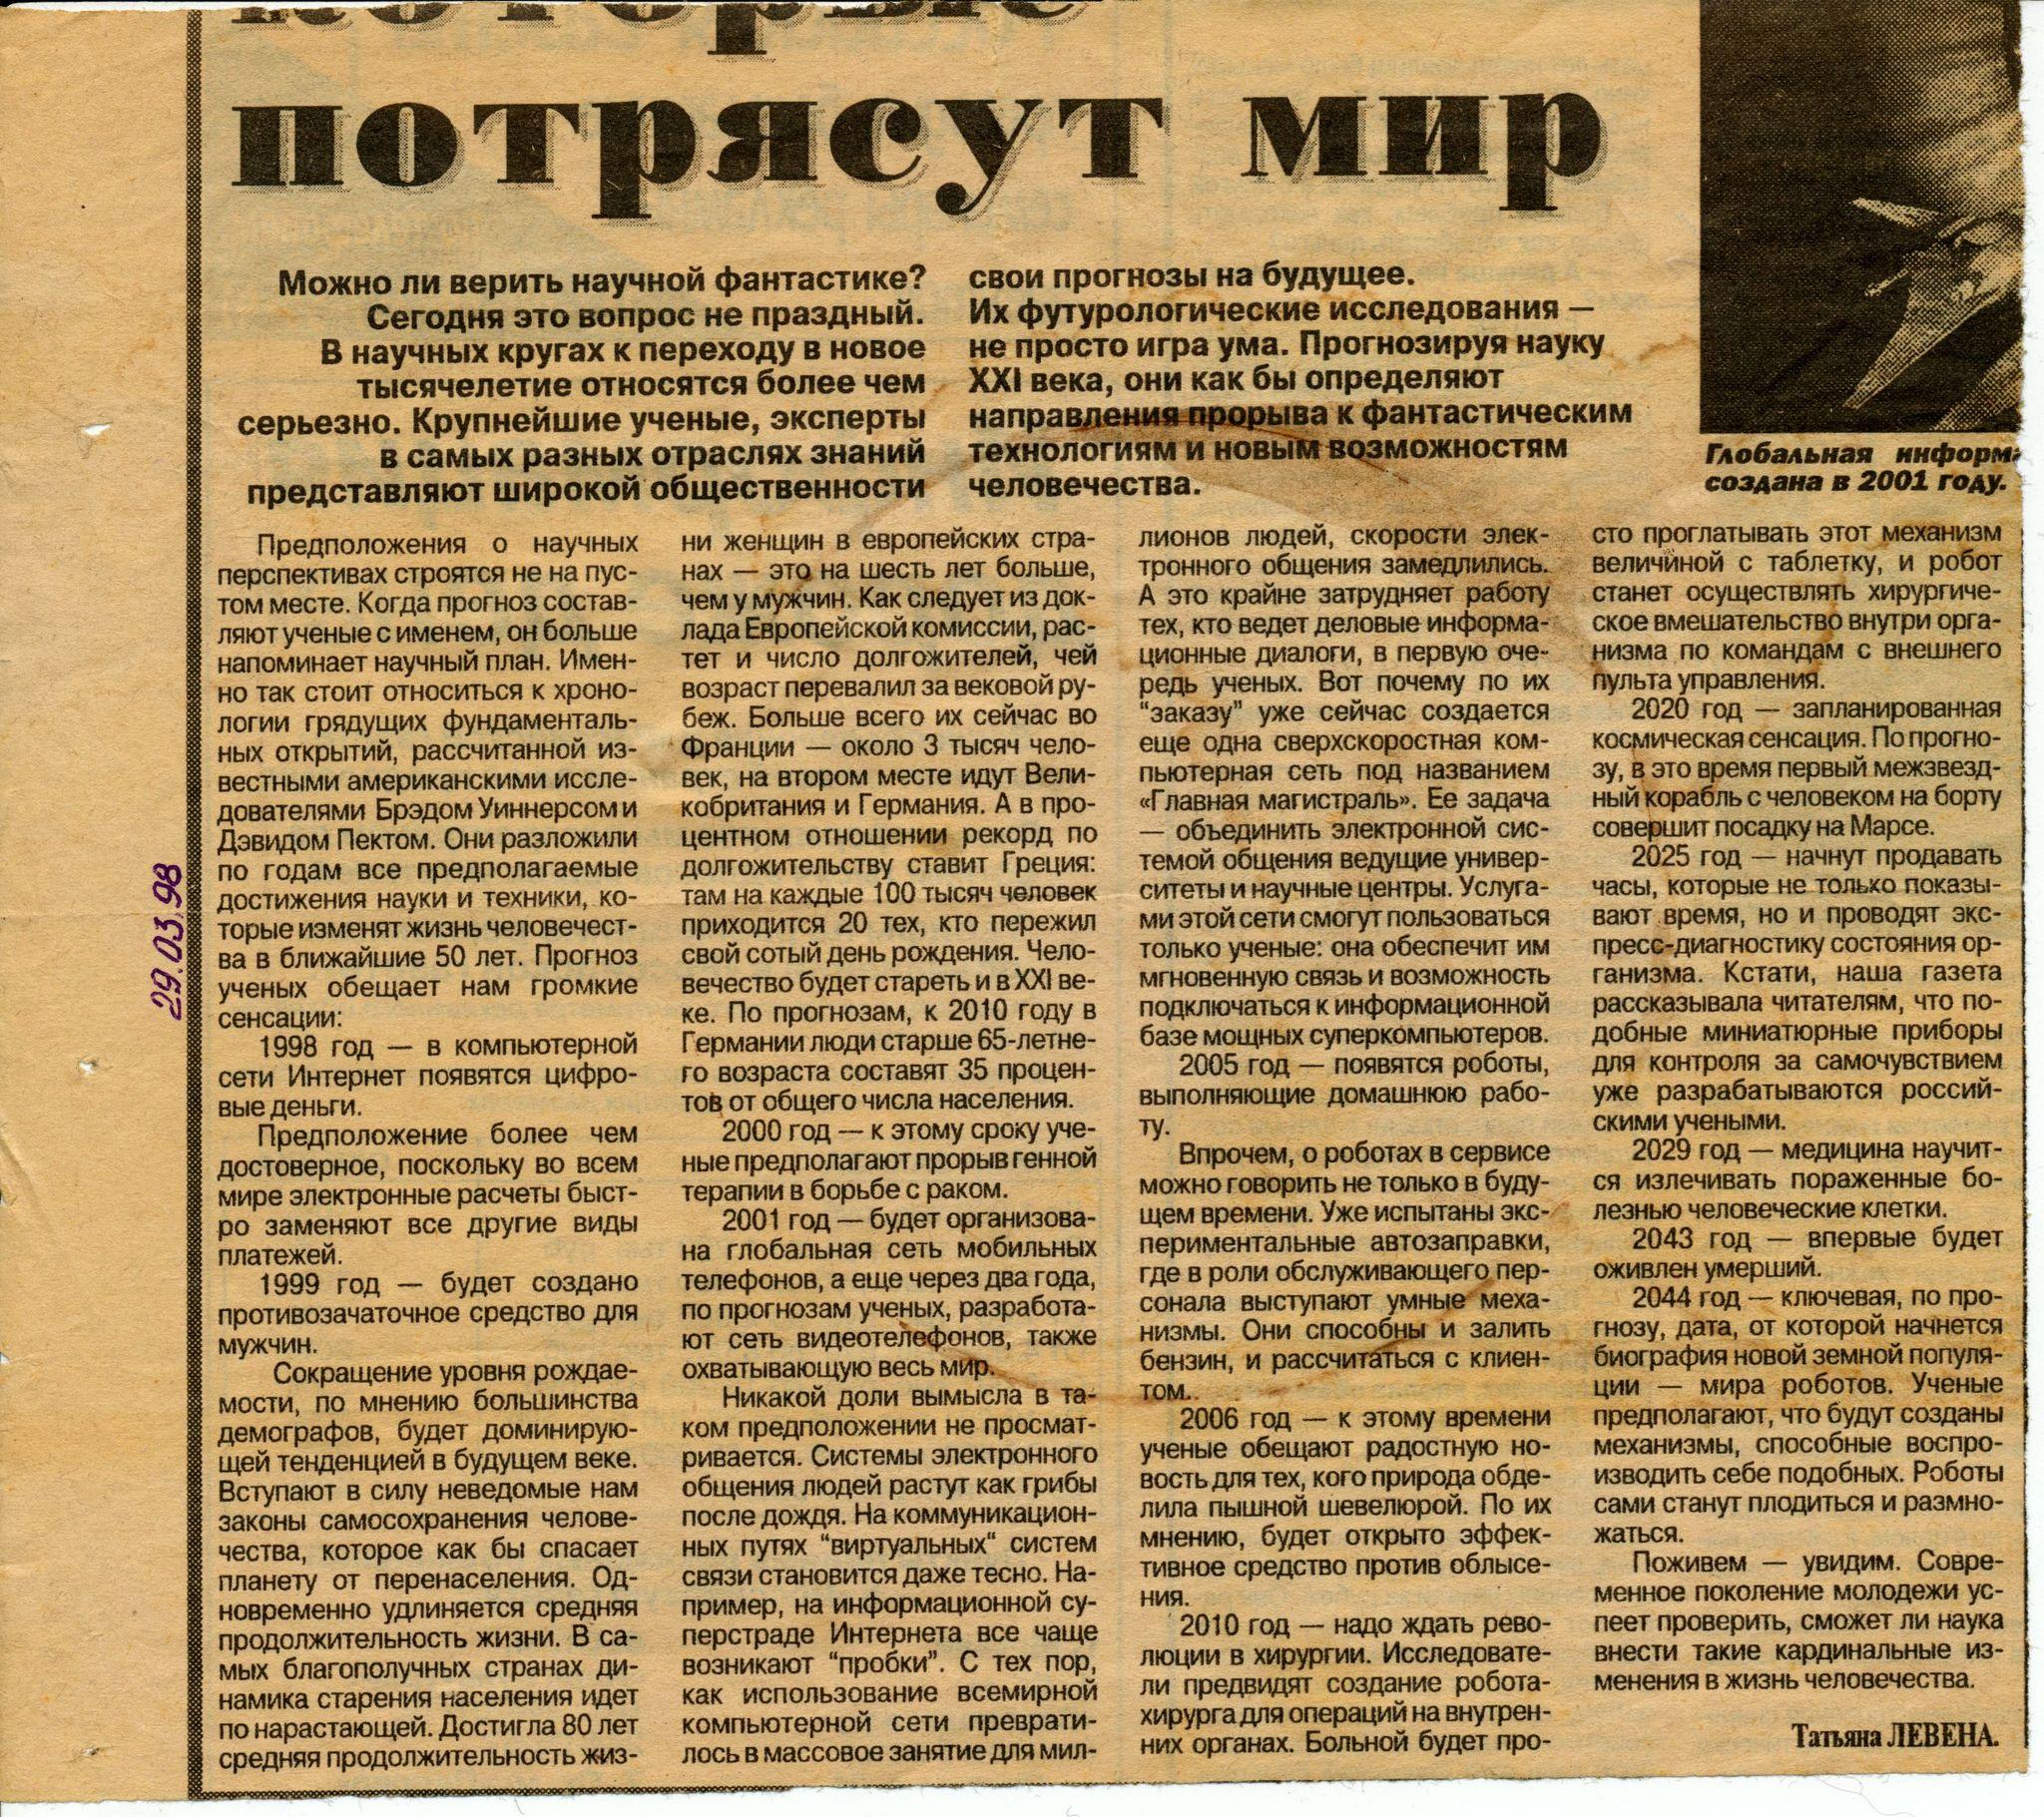 https://cs11.pikabu.ru/post_img/big/2020/07/27/9/1595864885141662066.jpg